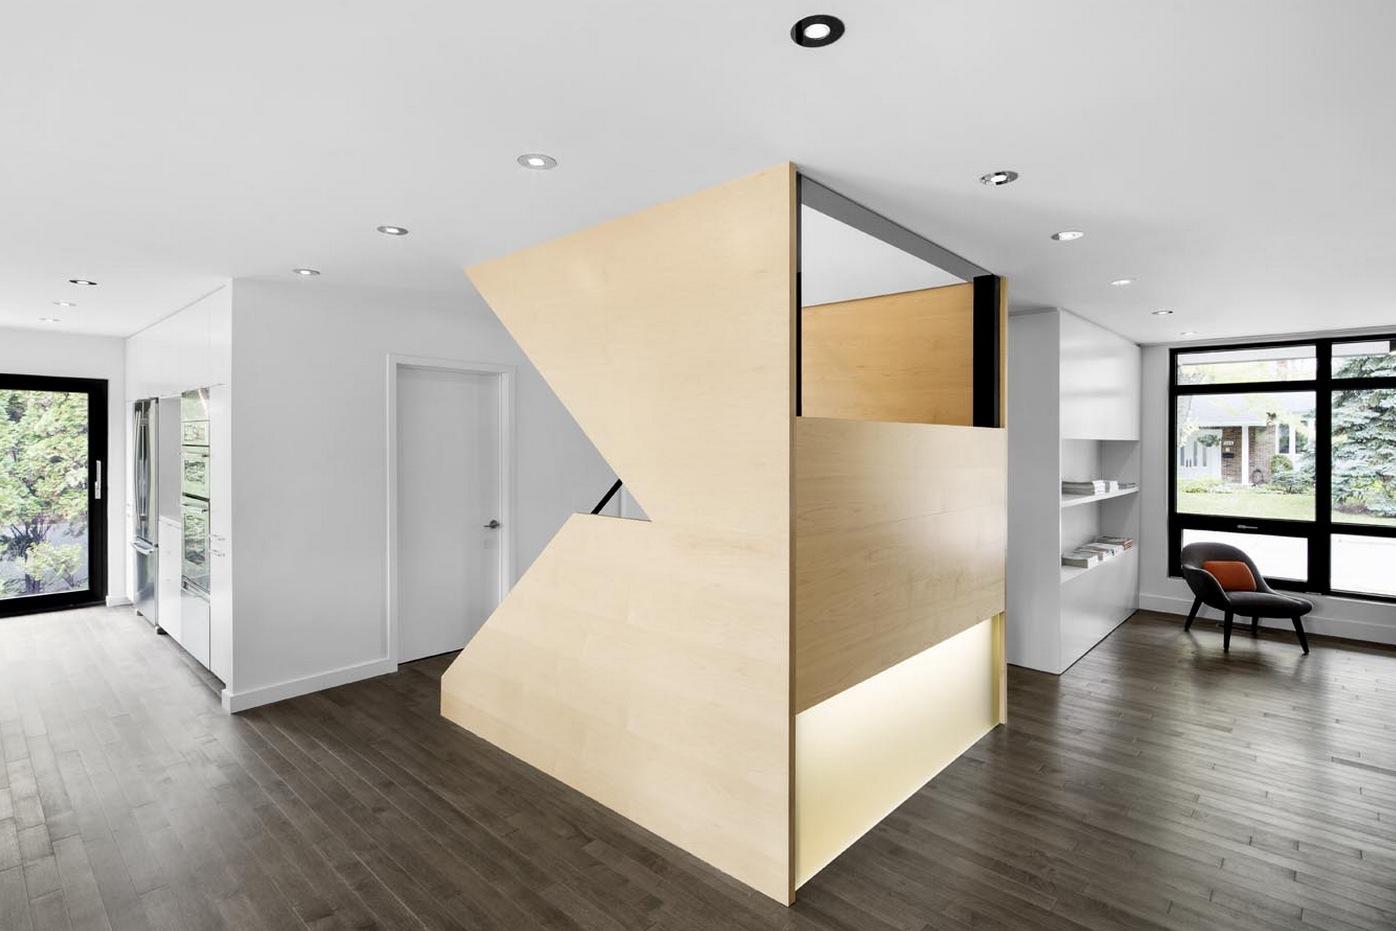 Residence-Closse-naturehumaine-design-08